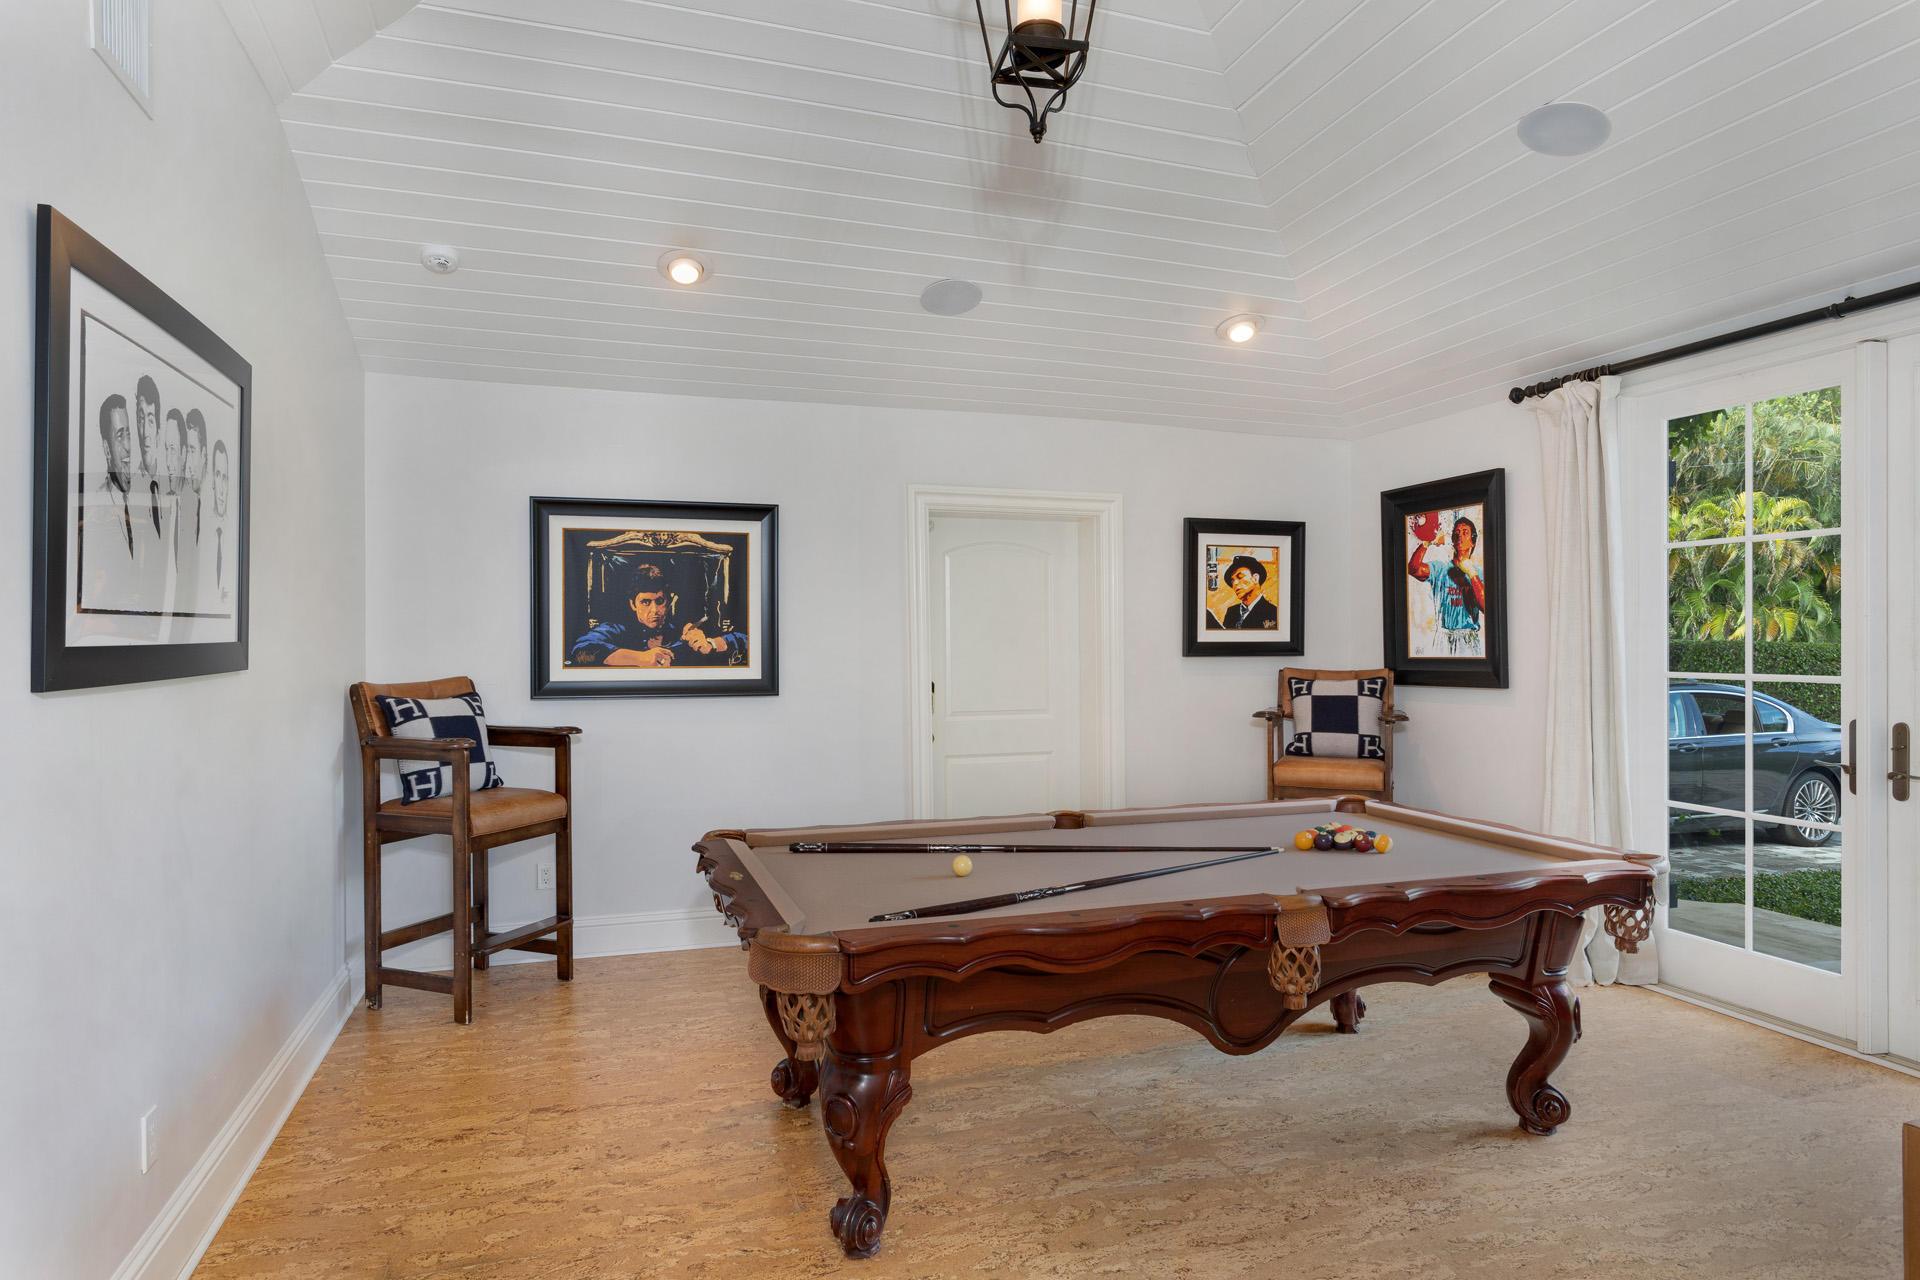 717 Seagate Drive, Delray Beach, Florida 33483, 7 Bedrooms Bedrooms, ,4.3 BathroomsBathrooms,Single Family Detached,For Sale,Seagate,RX-10620750